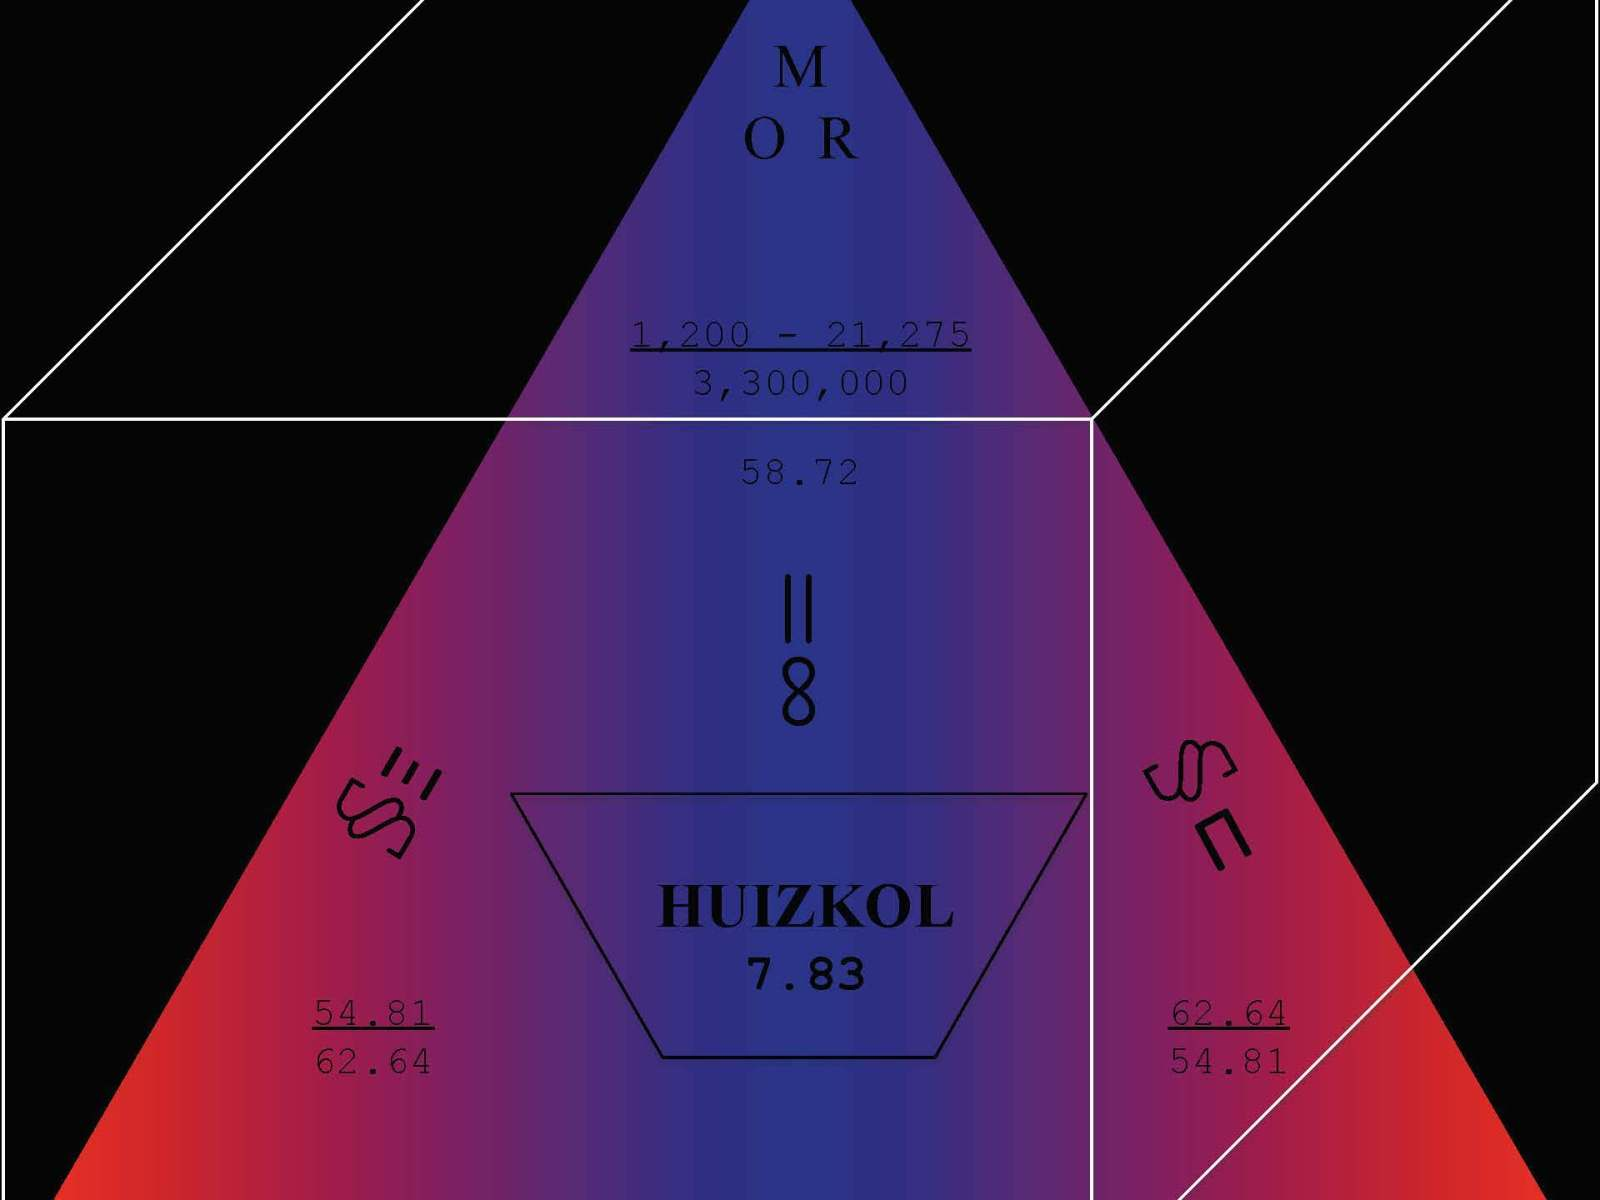 1595021695.Huizkol-1